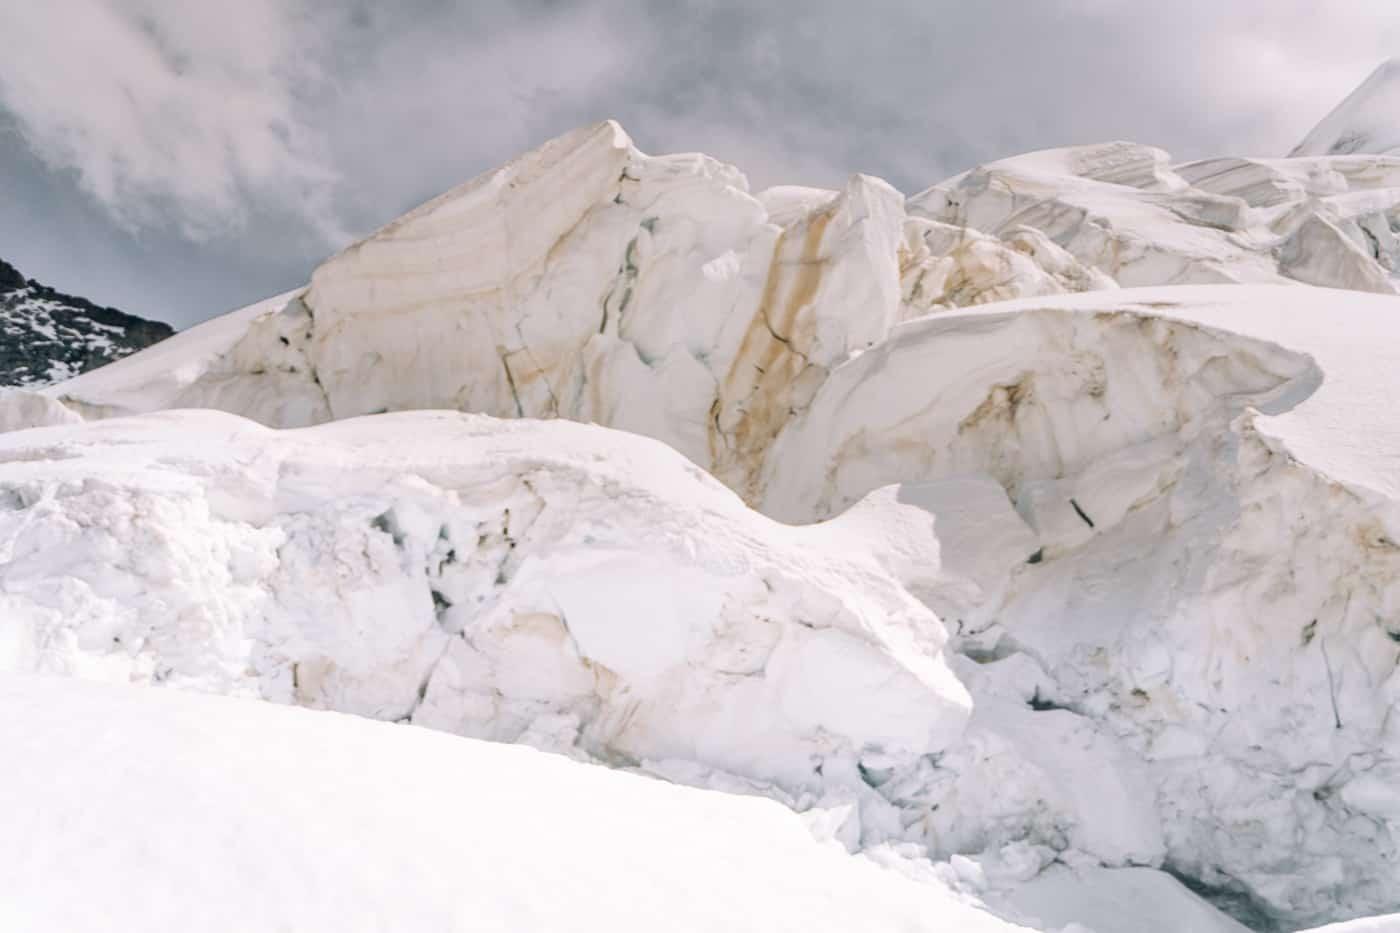 Wandern in Pontresina - 5 unvergessliche Bergtouren: Piz Bernina Hochtour